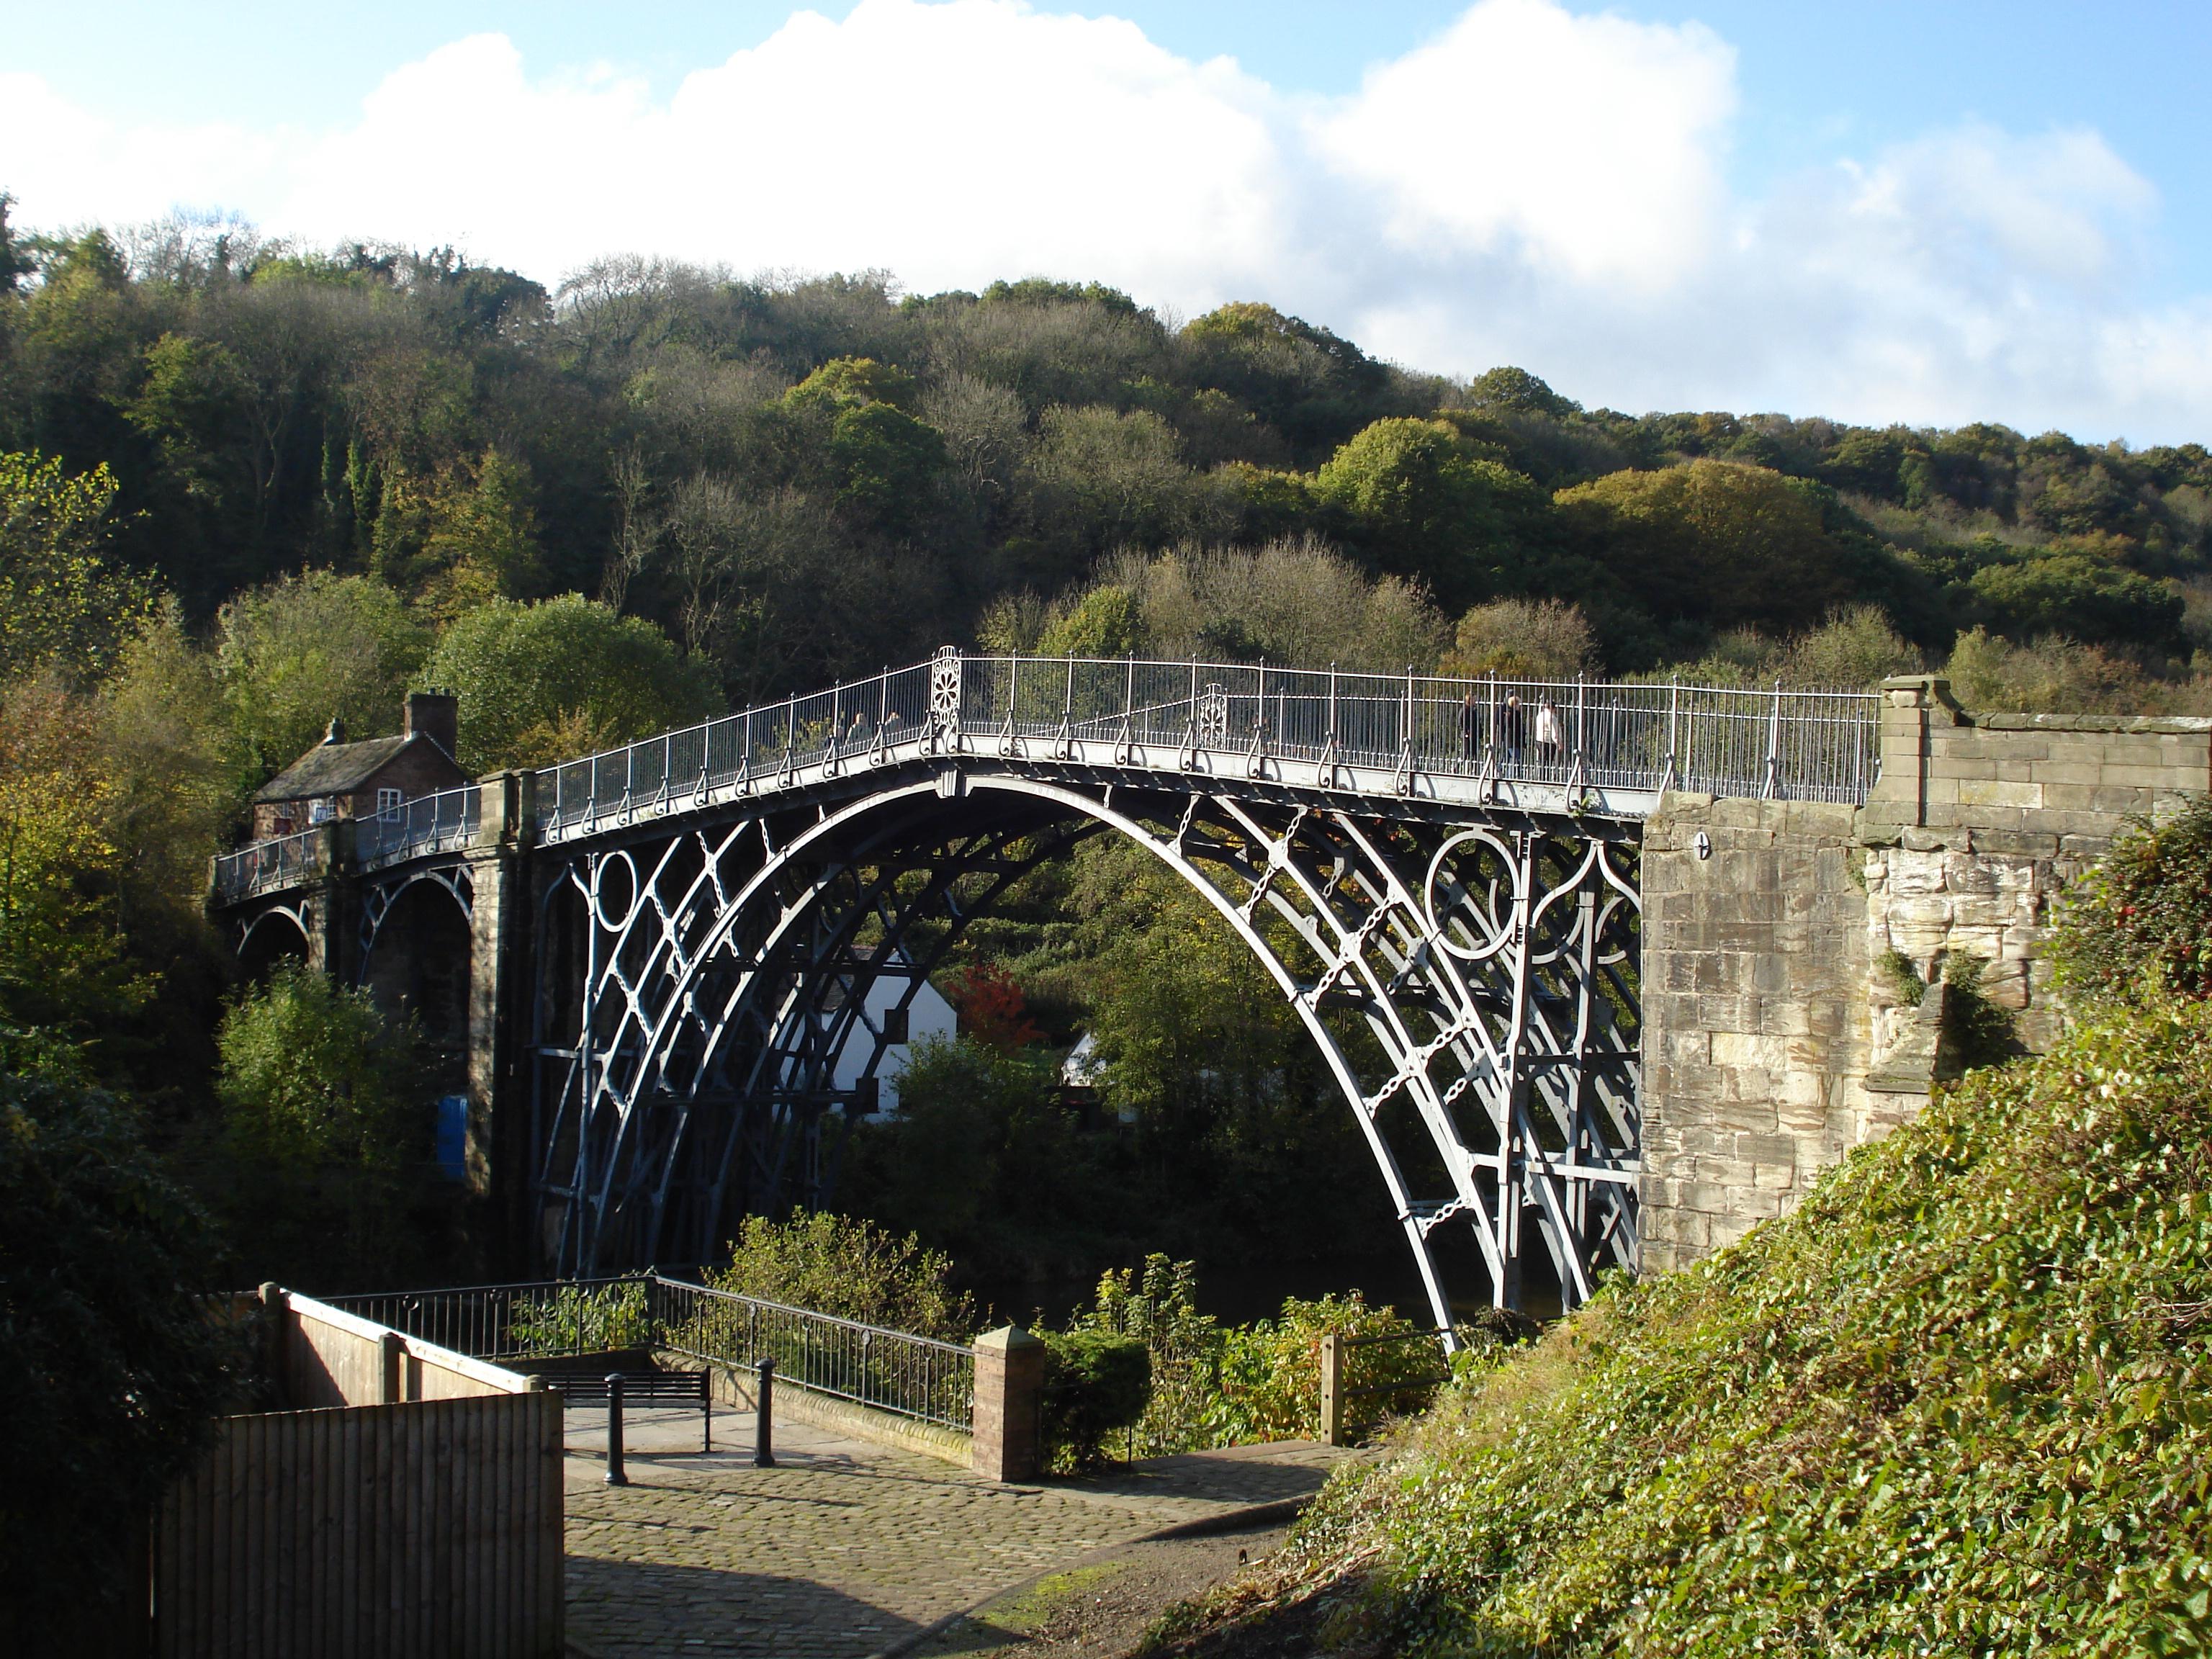 File:Ironbridge - panoramio - ian freeman.jpg - Wikimedia Commons